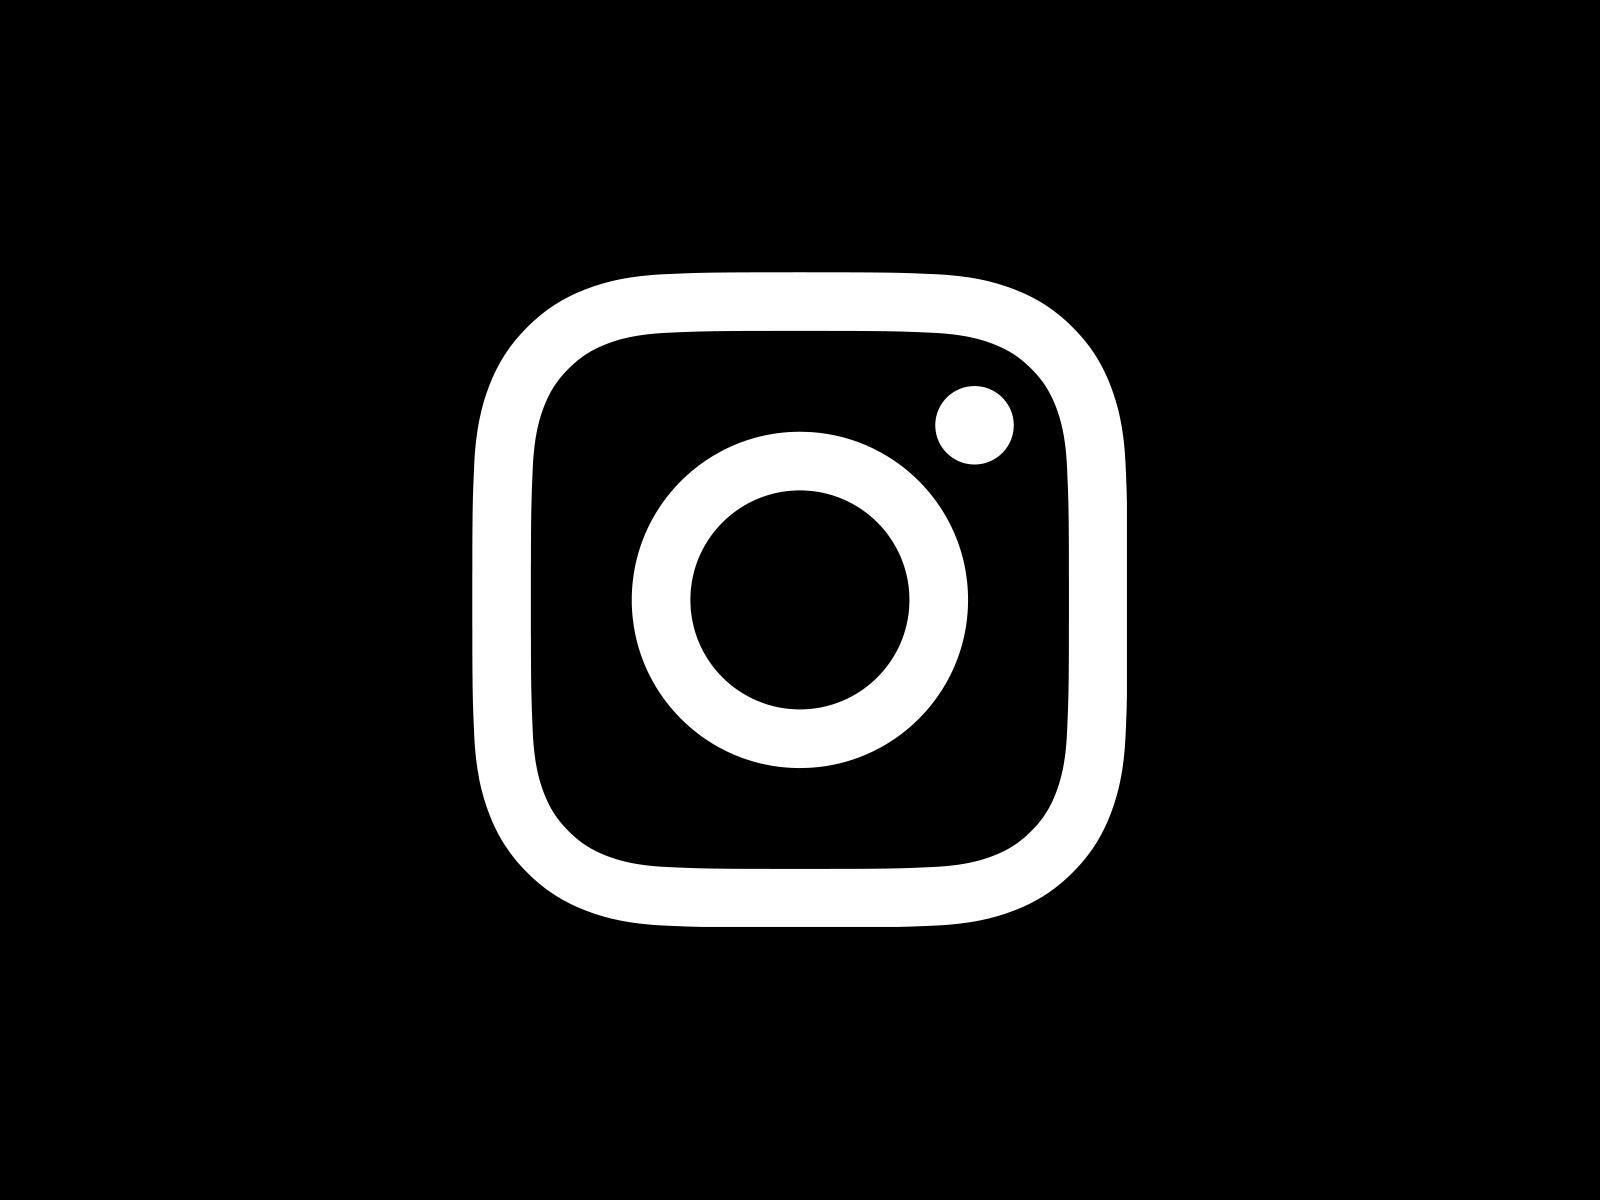 Google Image Result For Https I Pinimg Com Originals 63 9b 3d 639b3dafb544d6f061fcddd2d6686ddb P Instagram Logo Transparent New Instagram Logo Instagram Logo